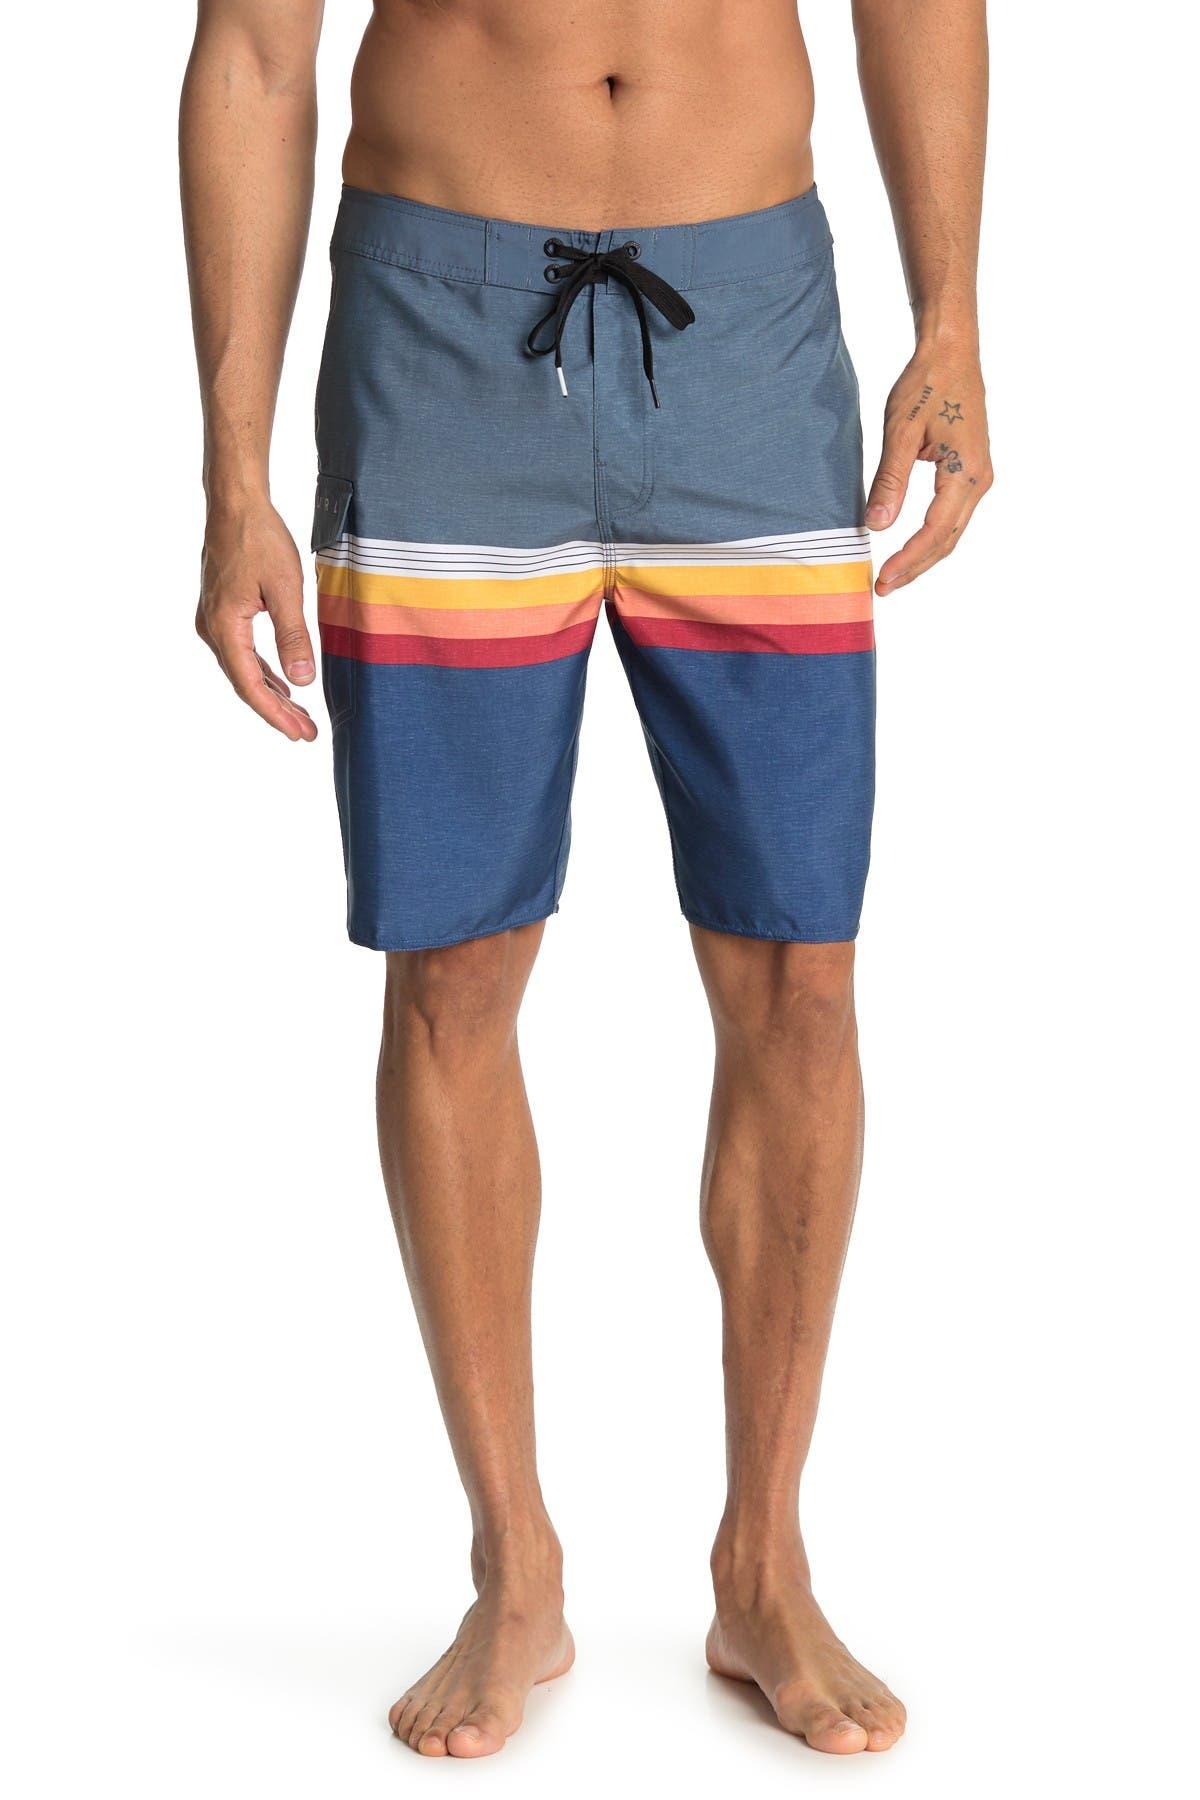 Image of Rip Curl Beach Street Striped Boardshorts